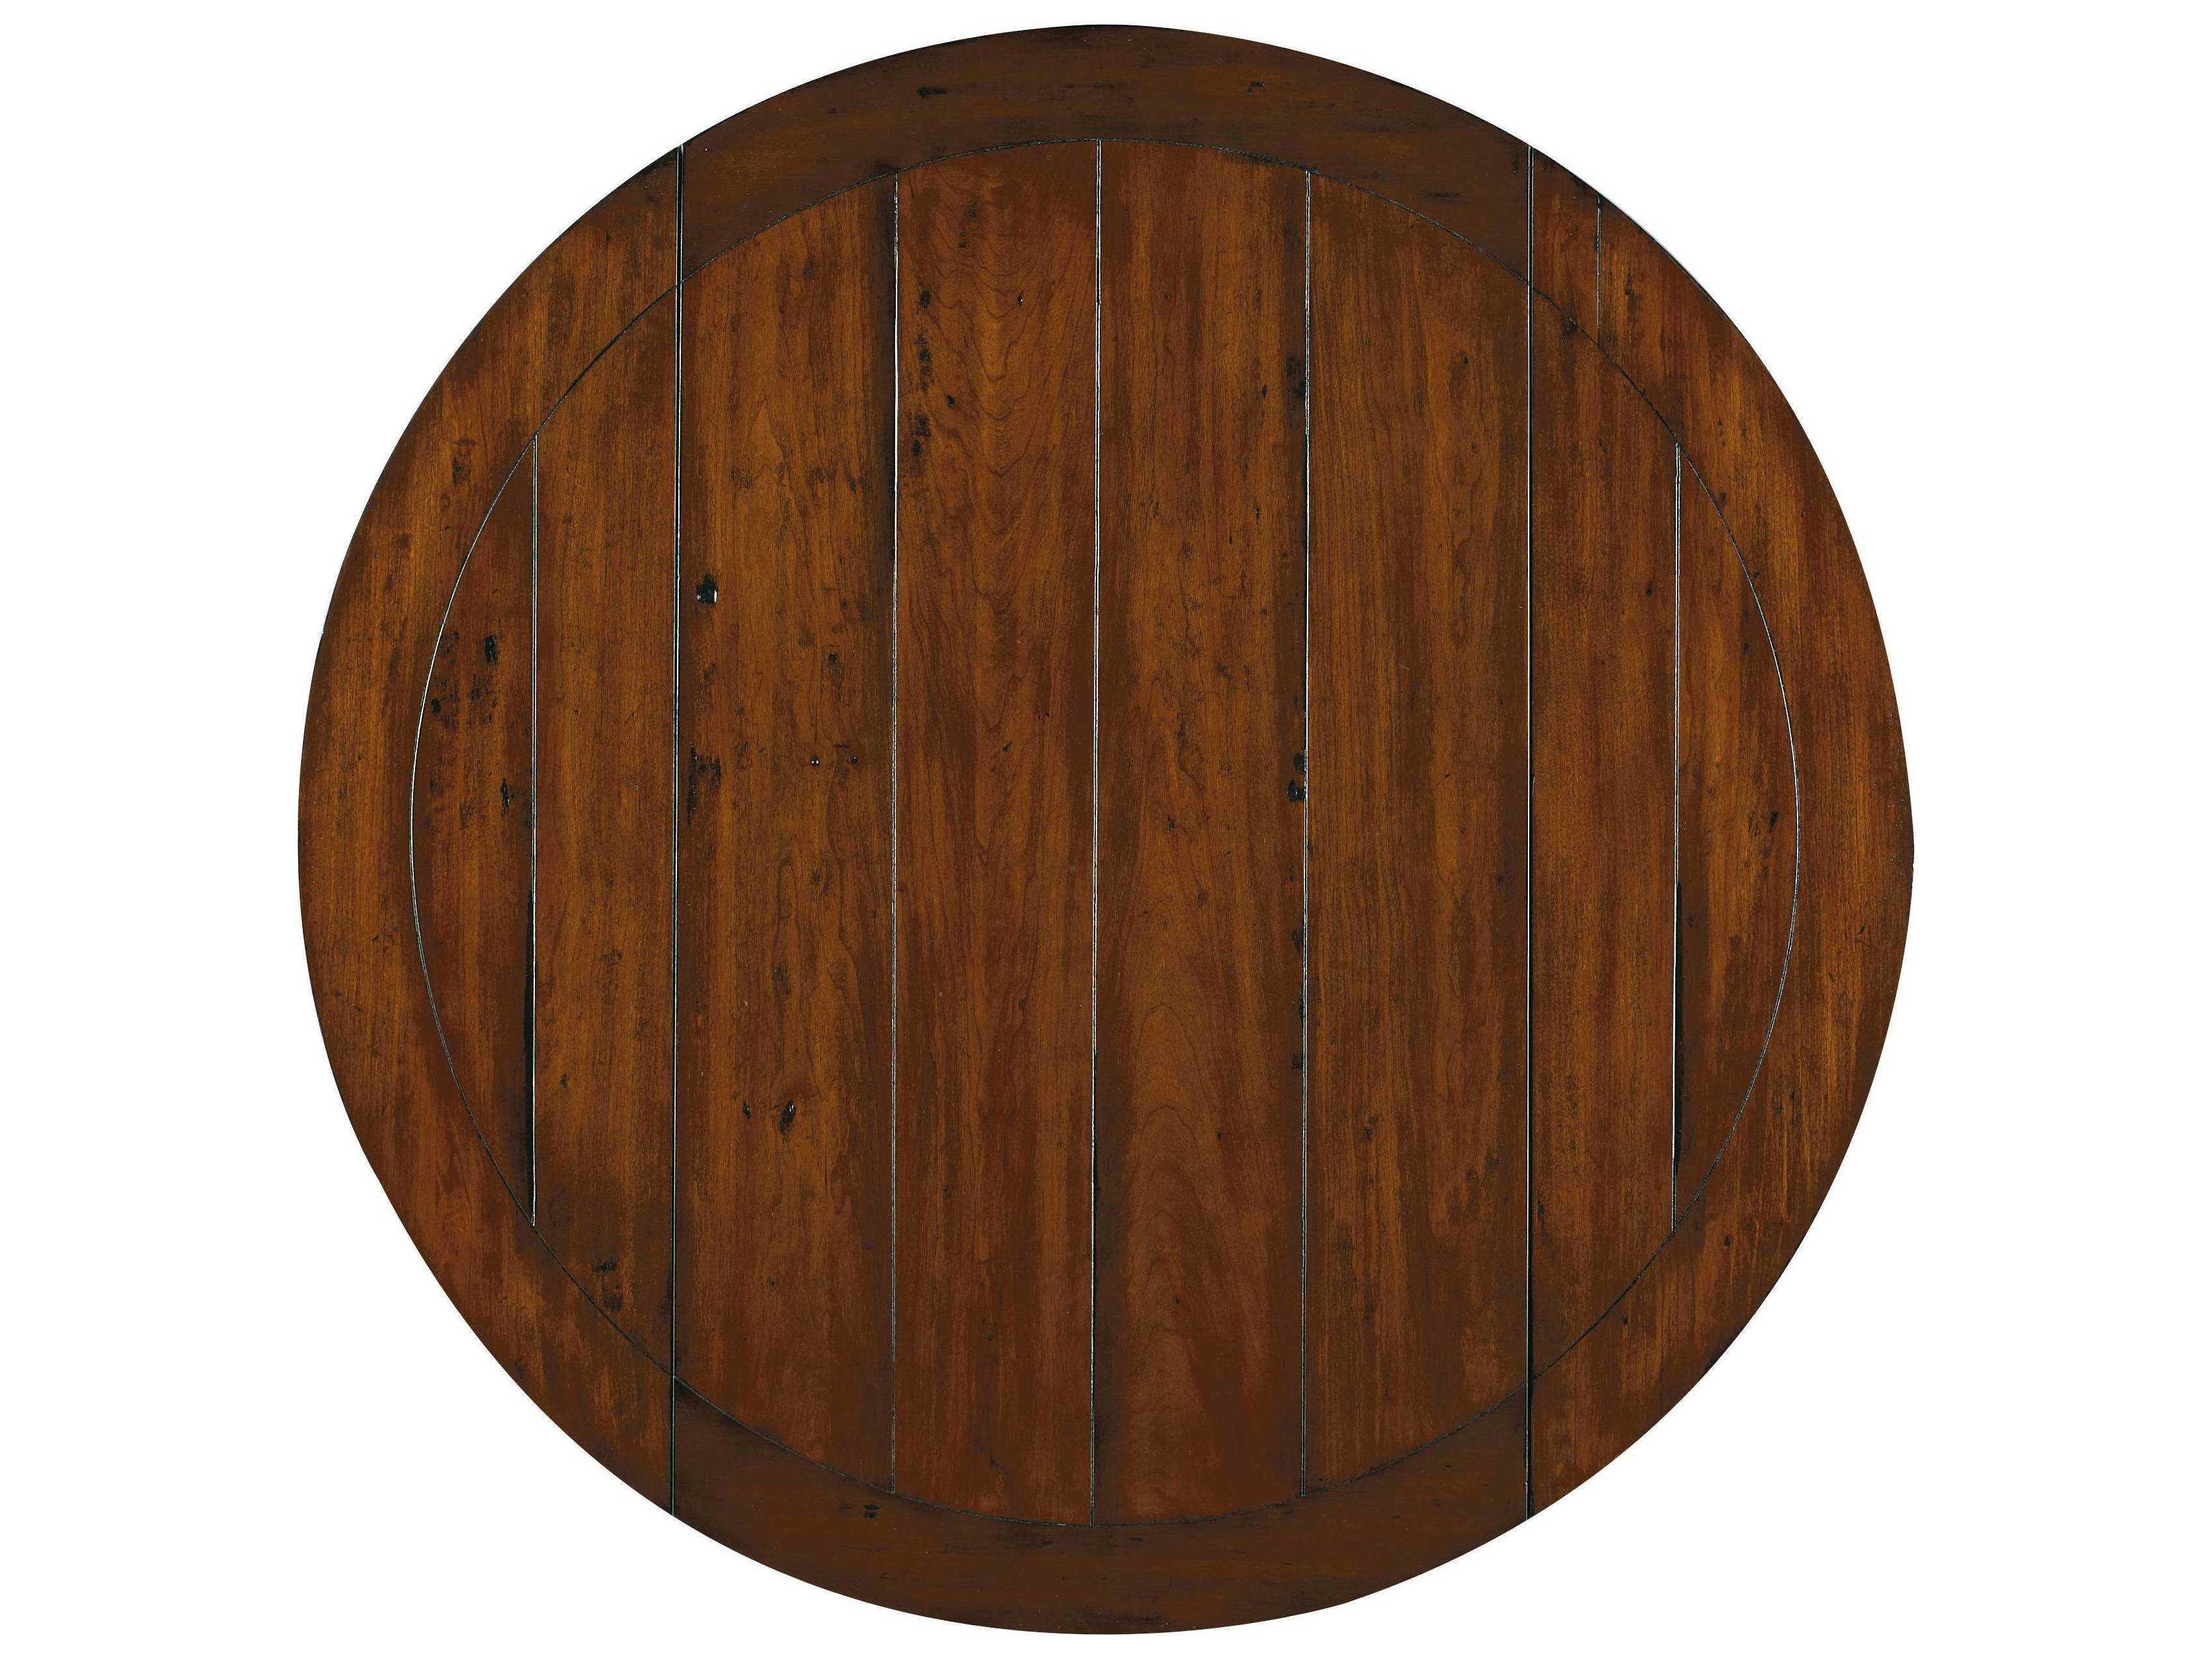 ... Hooker Furniture Waverly Place Distressed Antique Cherry 44u0027u0027 Wide Round  Drop Leaf Pedestal Dining